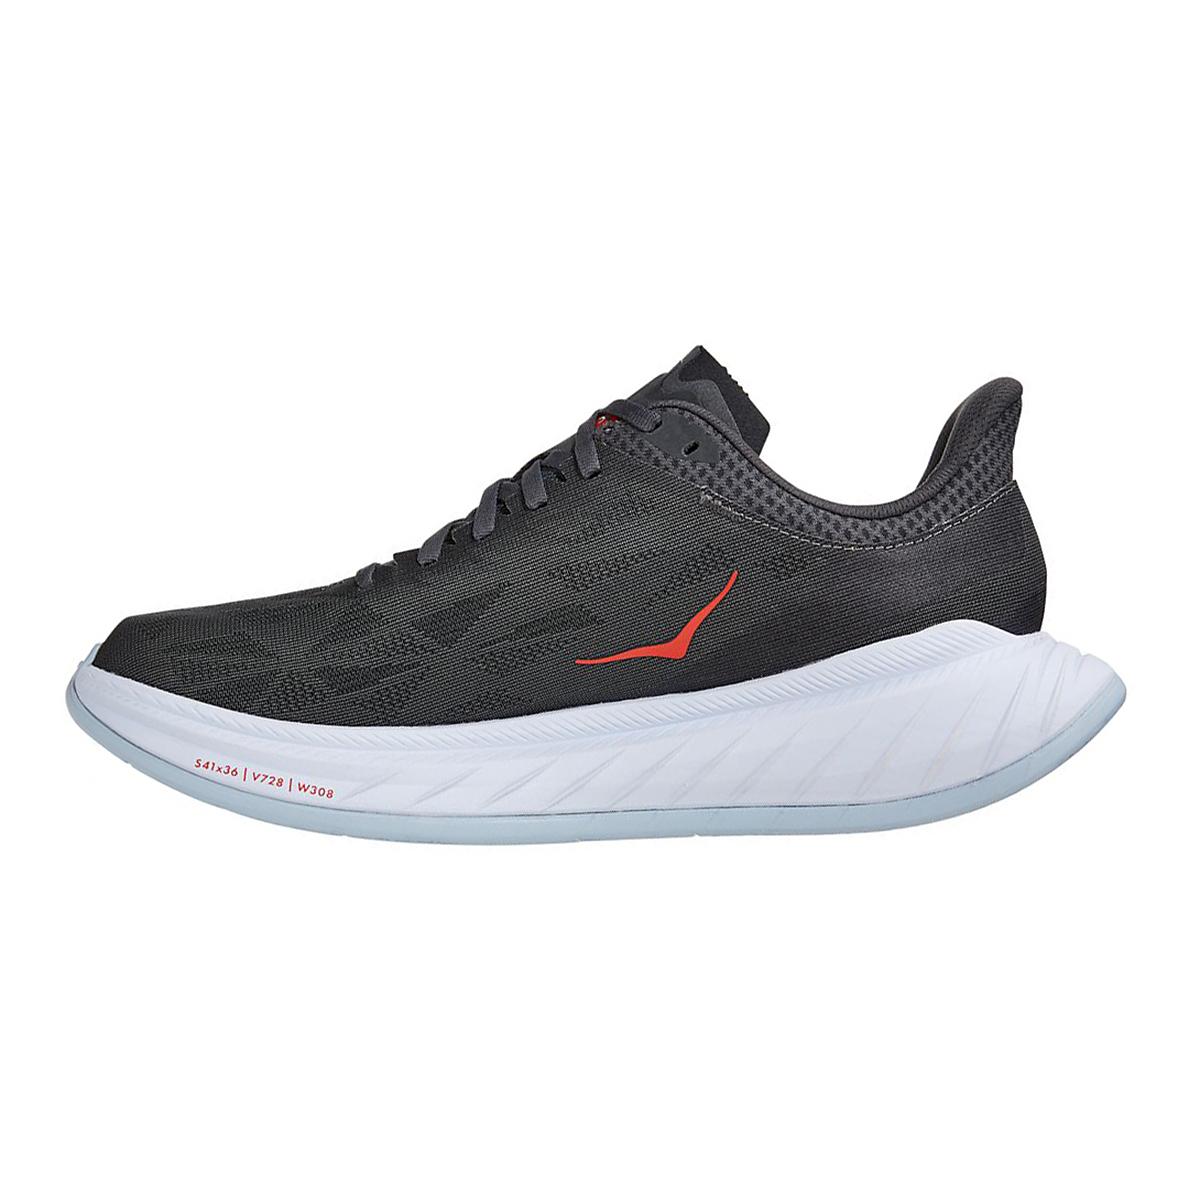 Men's Hoka One One Carbon X 2 Running Shoe - Color: Dark Shadow/Fiesta - Size: 7 - Width: Regular, Dark Shadow/Fiesta, large, image 2